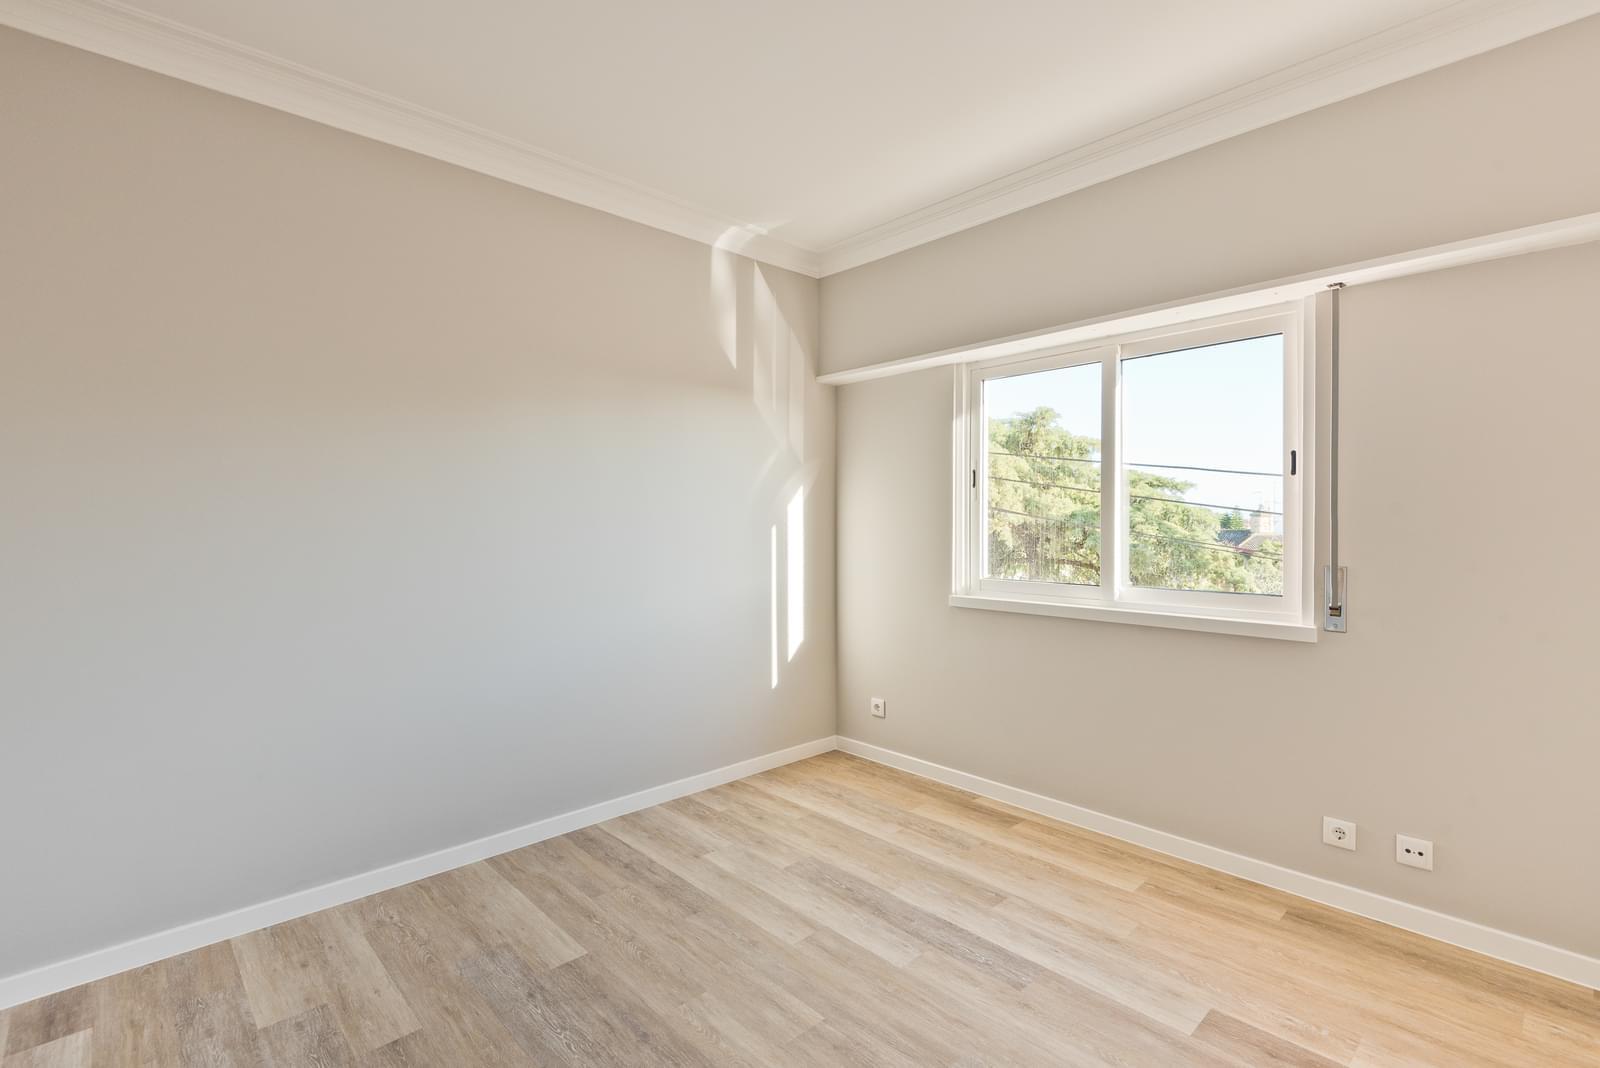 pf18956-apartamento-t3-1-cascais-ea41e17c-427d-43c9-89ed-7bb1d8dfc09a